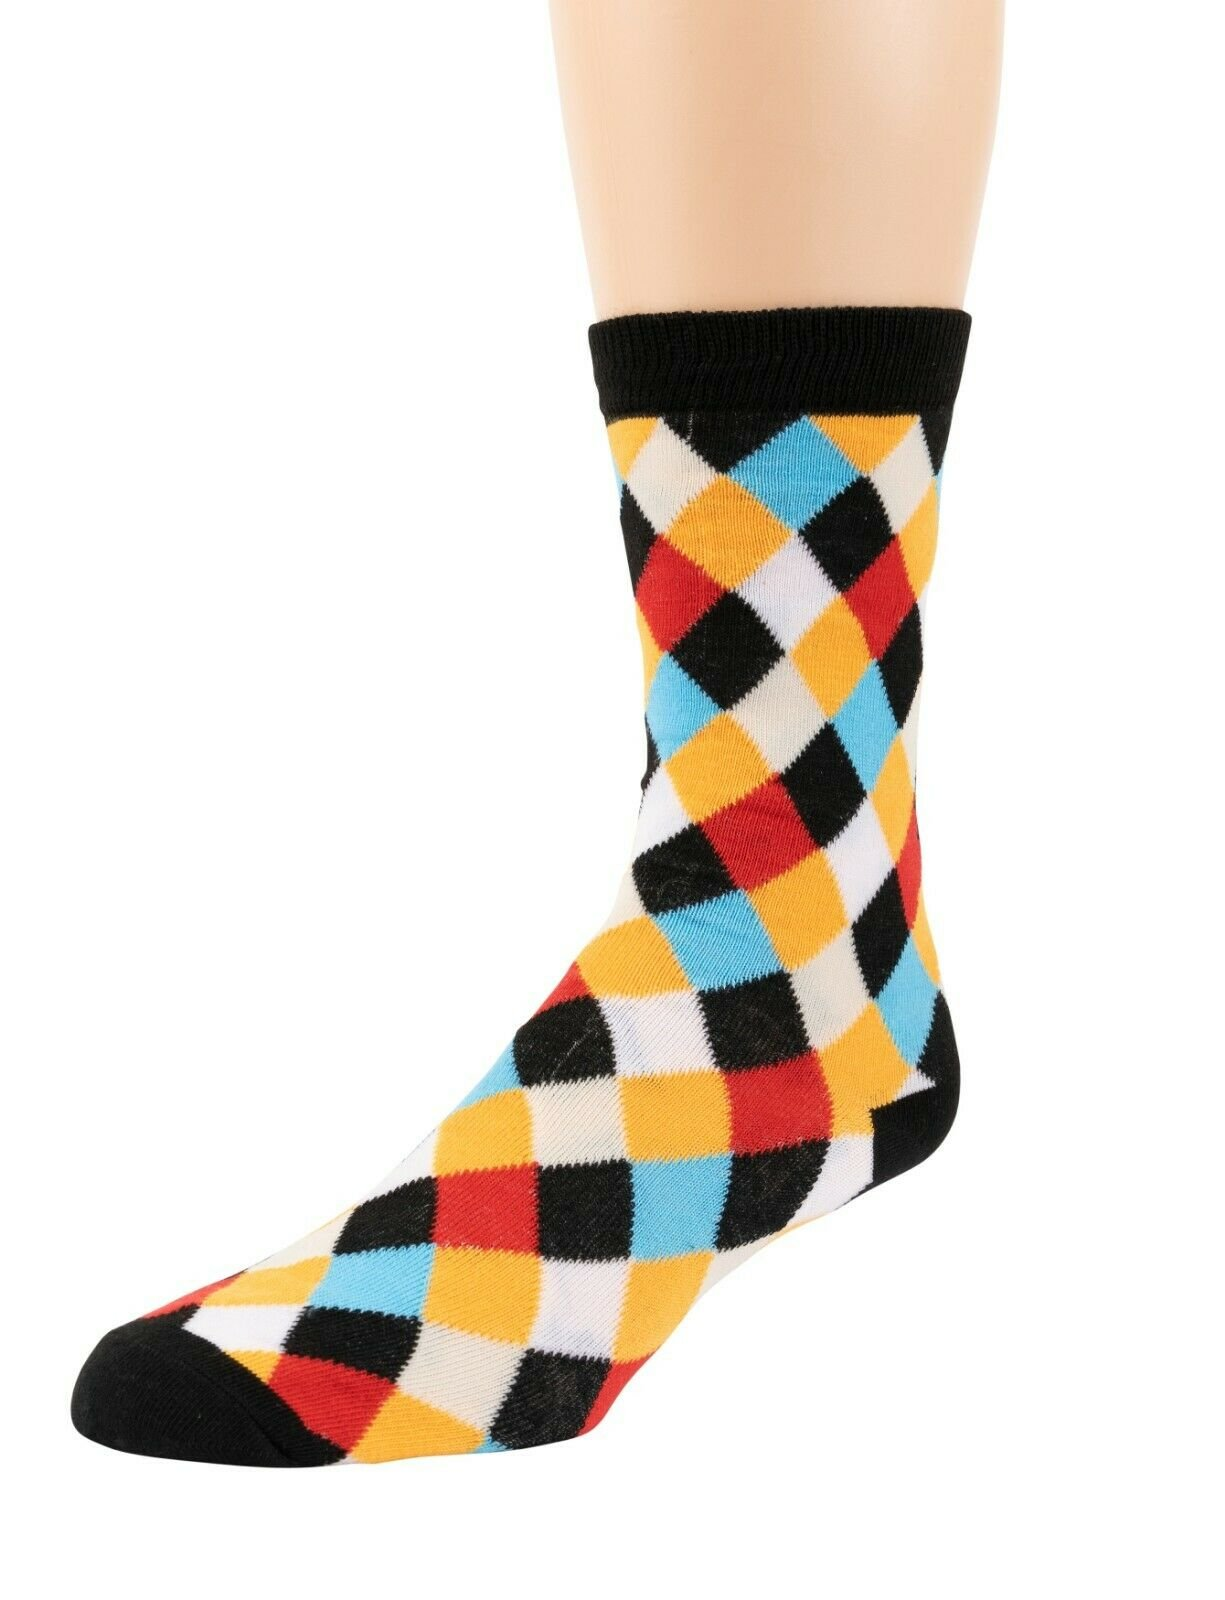 Mitch-Bogen-Mens-Cotton-Dress-Socks-Colorful-Fashion-Crew-Socks-8-Pack-Gift-Box thumbnail 22